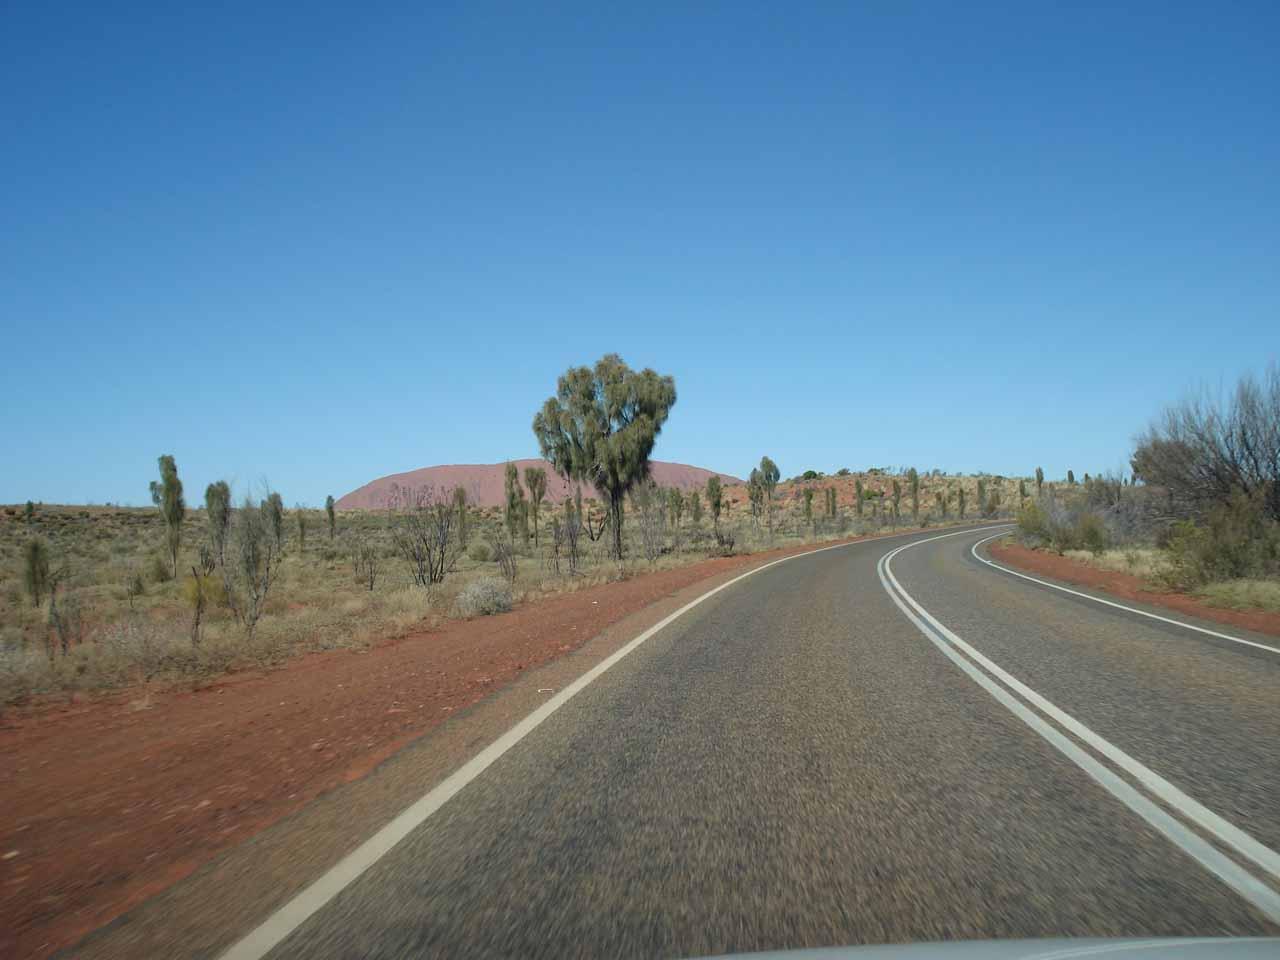 On the road to Kata Tjuta